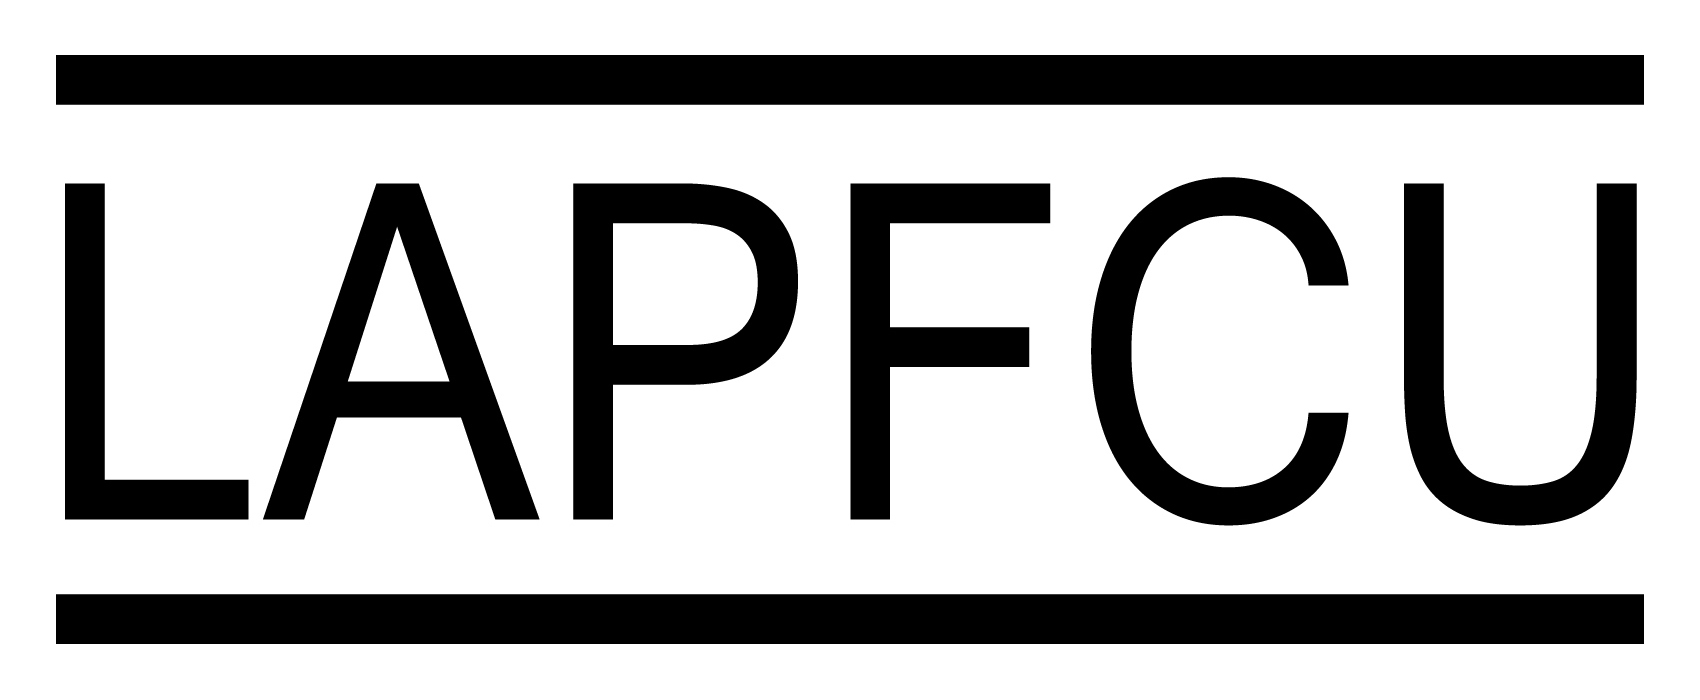 Los Angeles Police Federal Credit Union Lapfcu